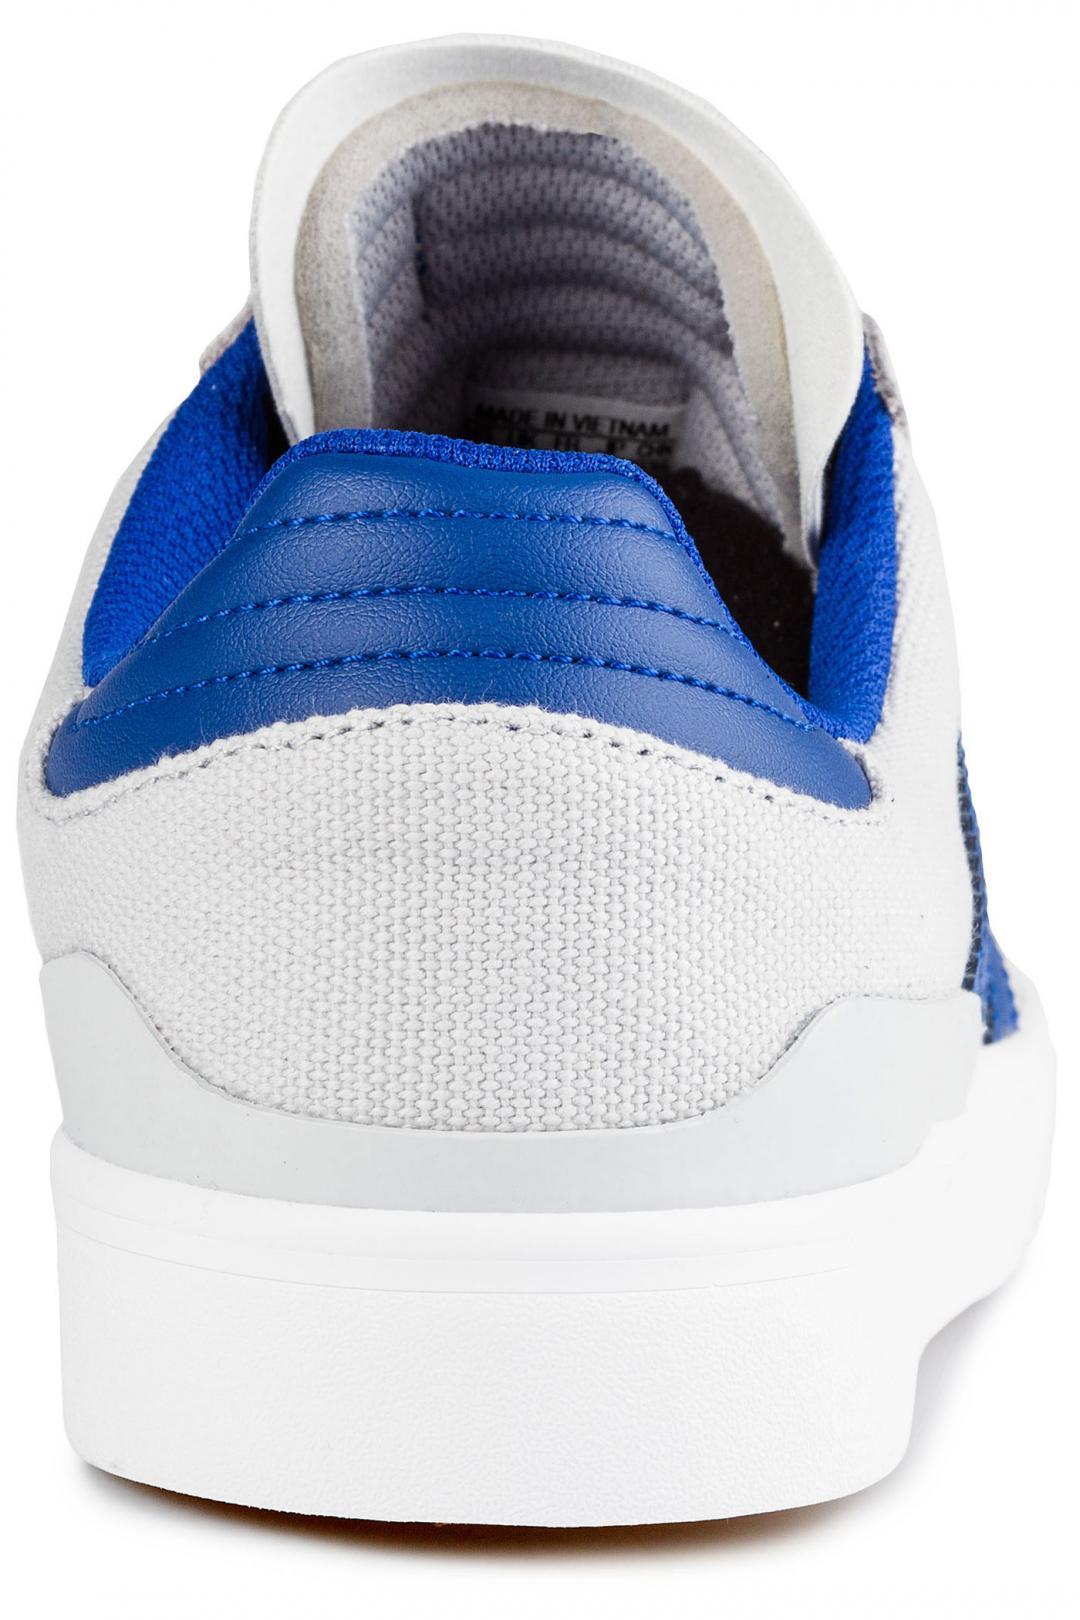 Uomo adidas Skateboarding Busenitz Vulc grey core royal white | Sneaker